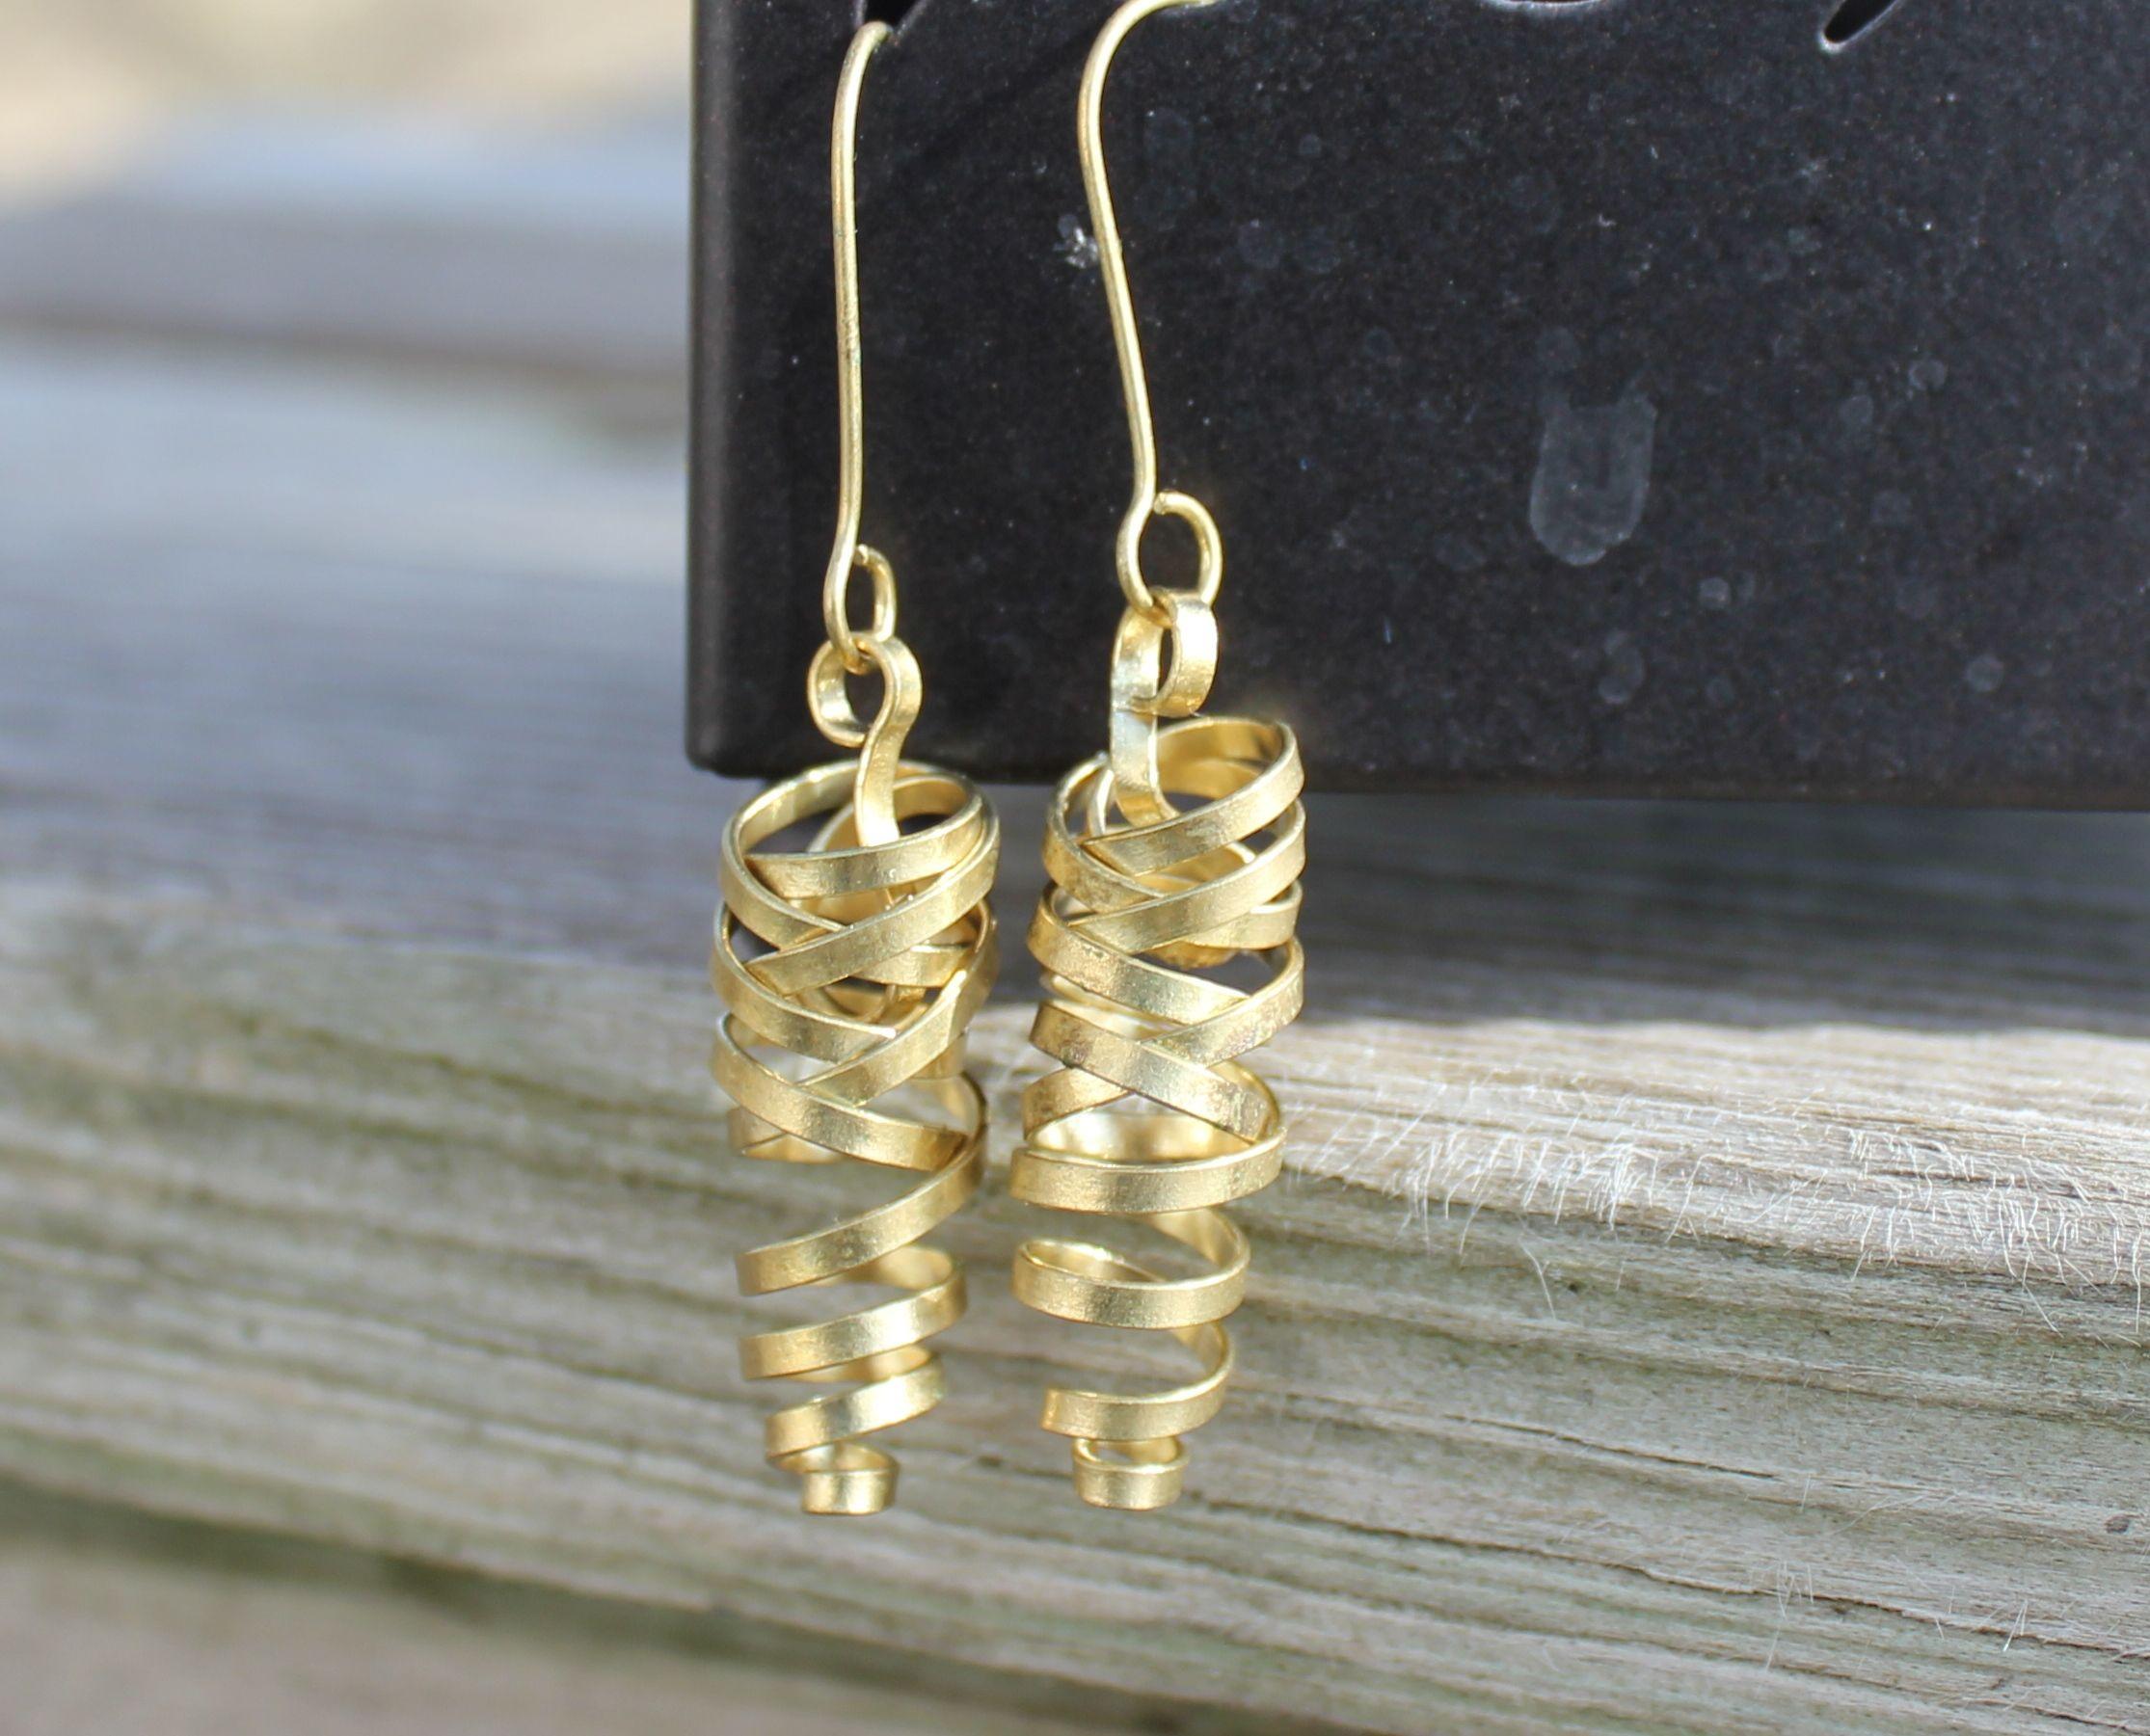 Brass Twisted Earrings - Handmade in Peru by Fair Trade Artisans.